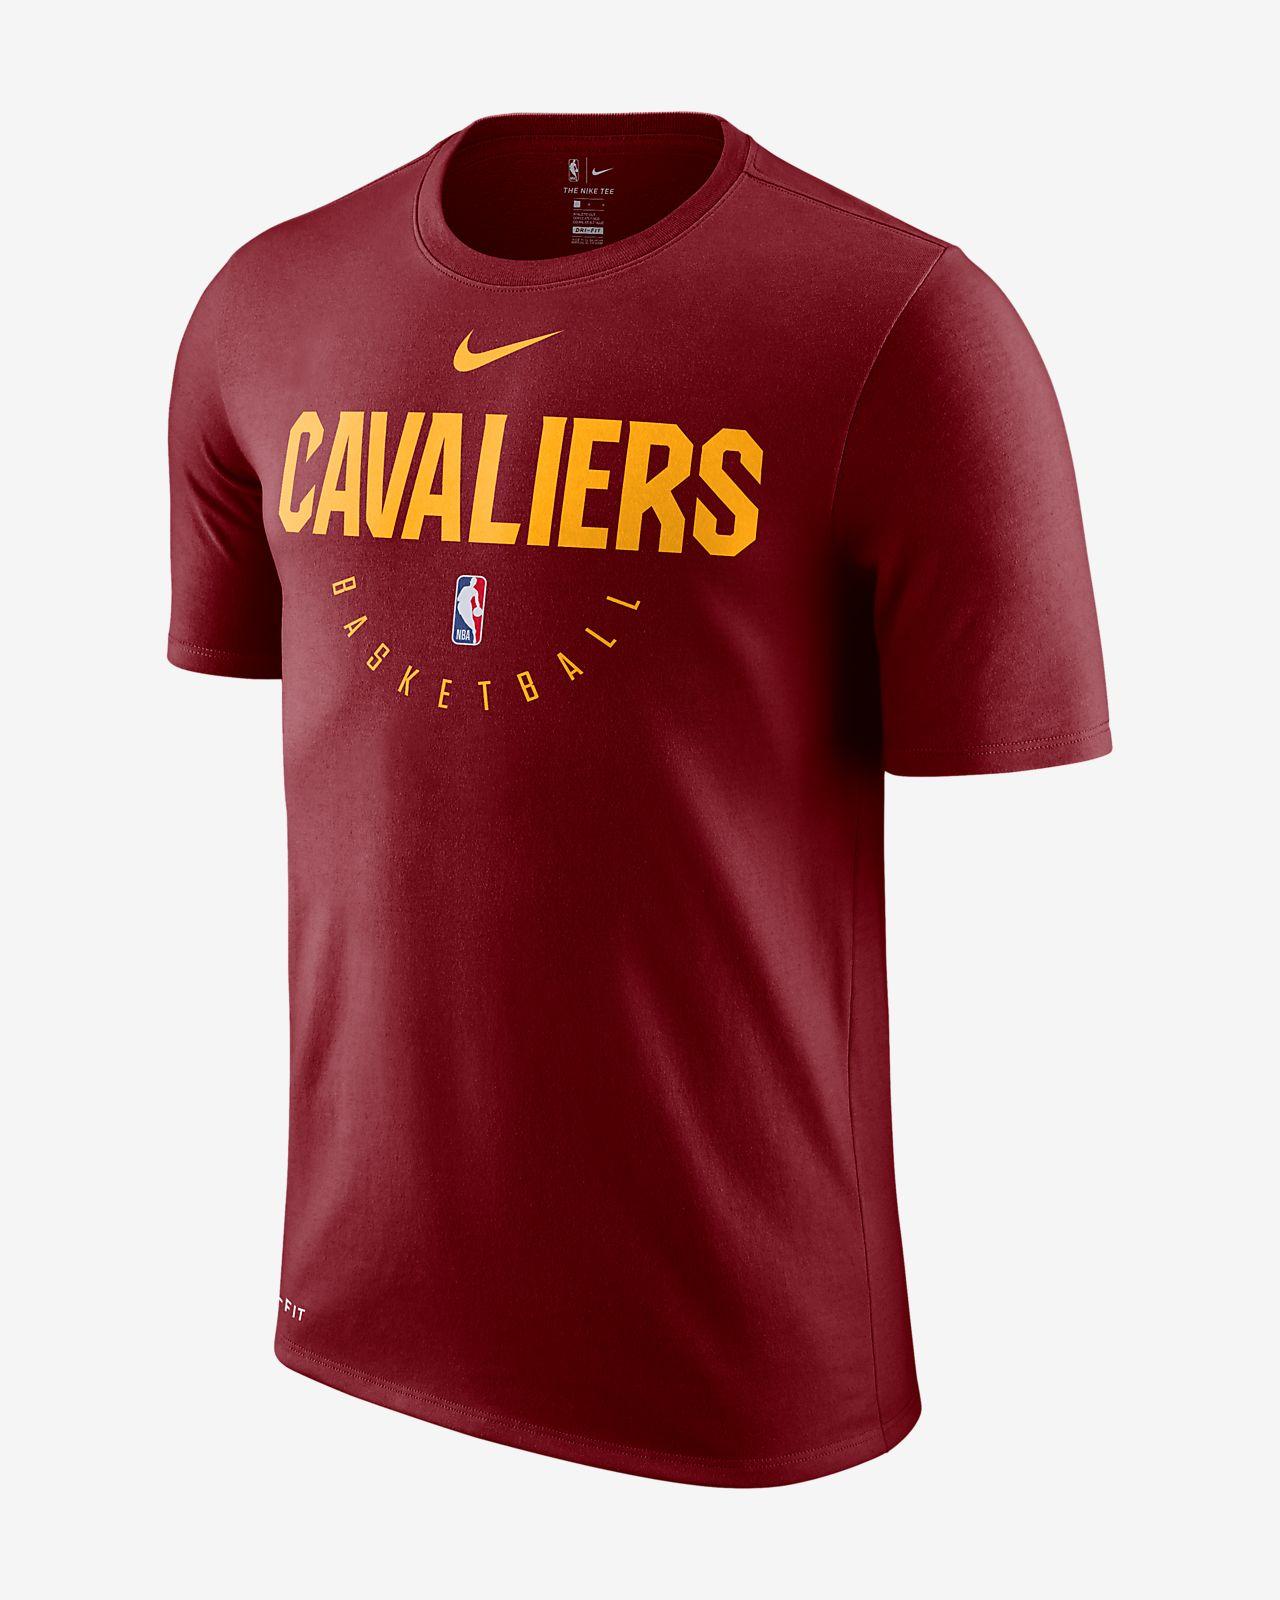 8b19be965 Cleveland Cavaliers Nike Dri-FIT Men's NBA T-Shirt. Nike.com IL